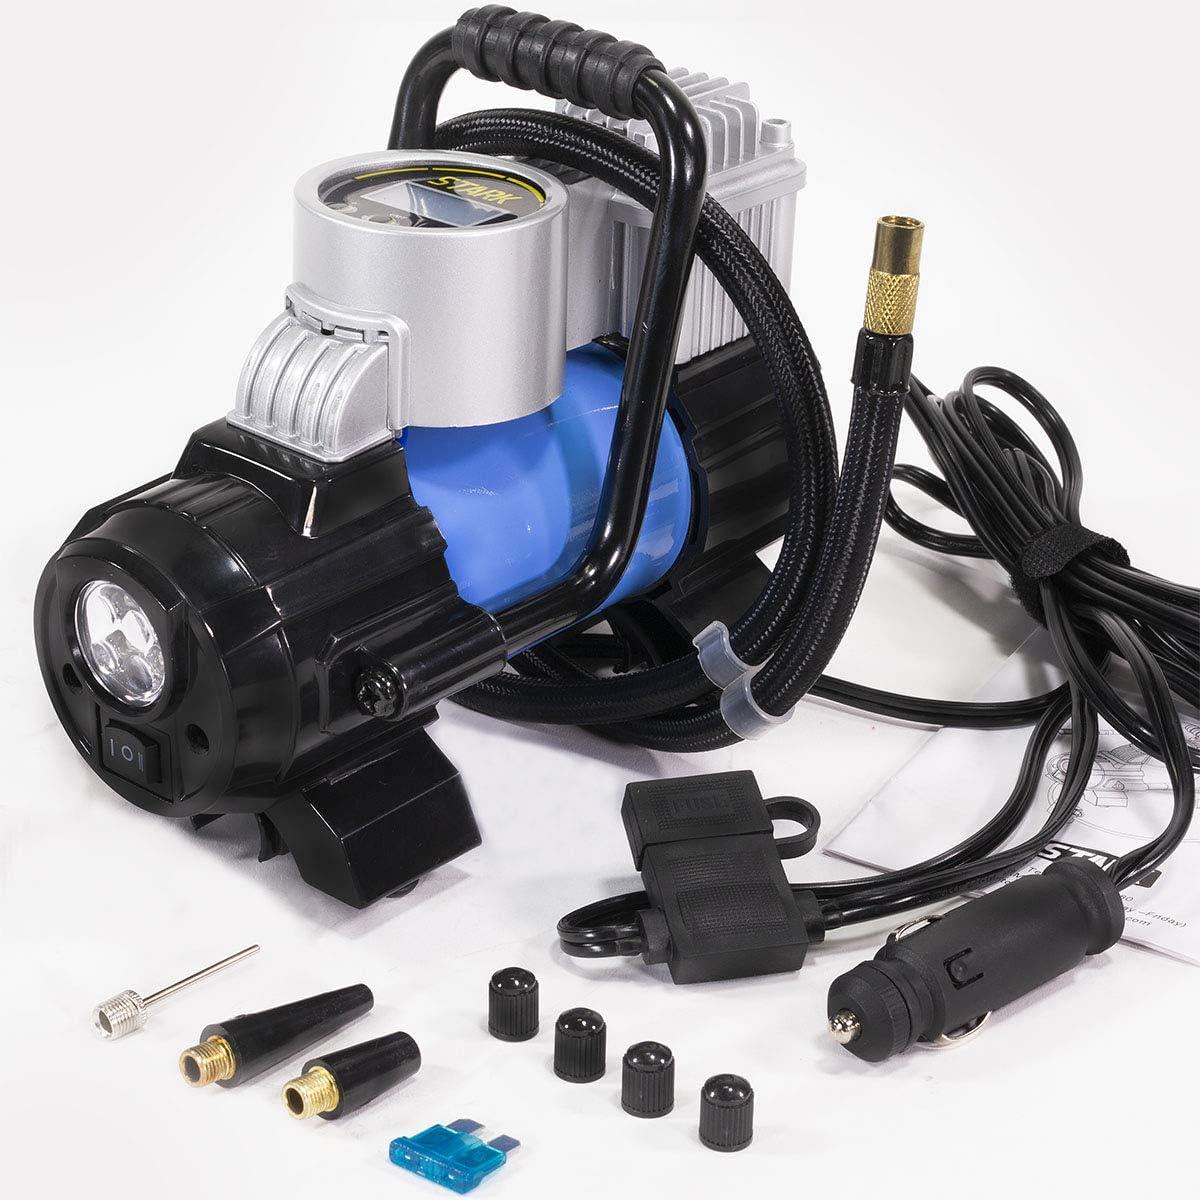 Stark Digital Tire Inflator 12V DC Portable Air Compressor Pump}